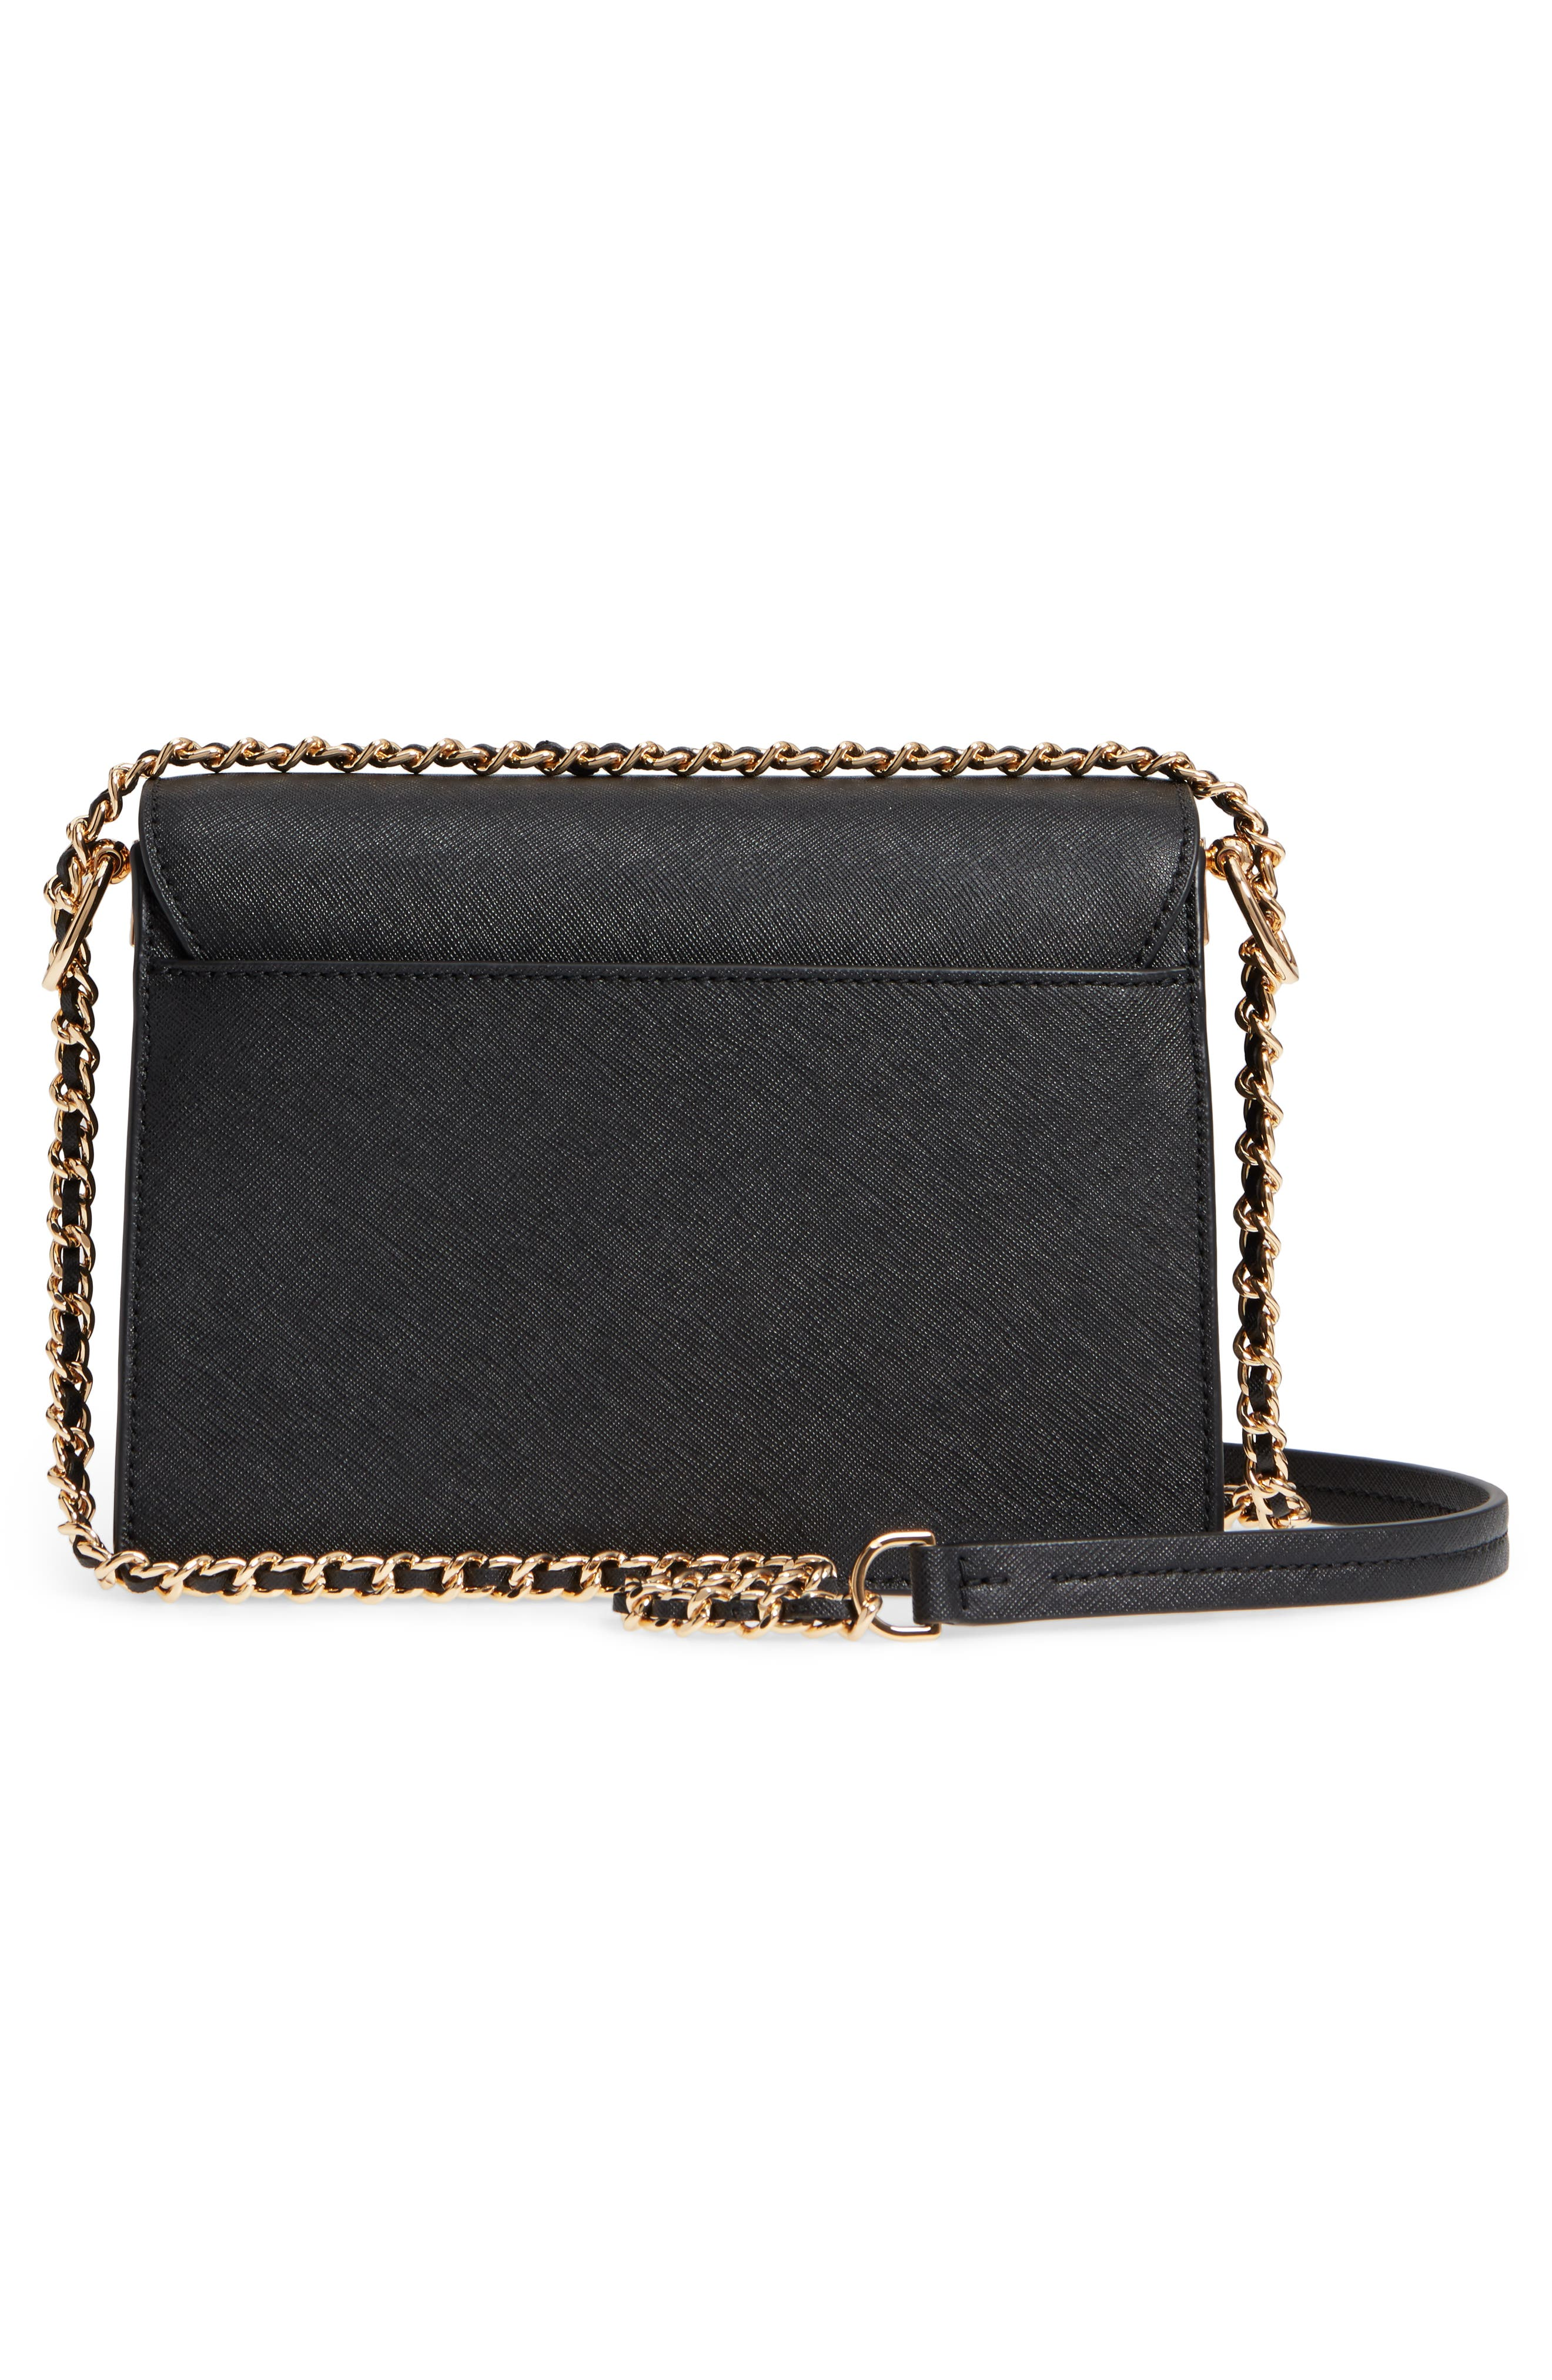 Robinson Convertible Leather Shoulder Bag,                             Alternate thumbnail 3, color,                             BLACK / ROYAL NAVY